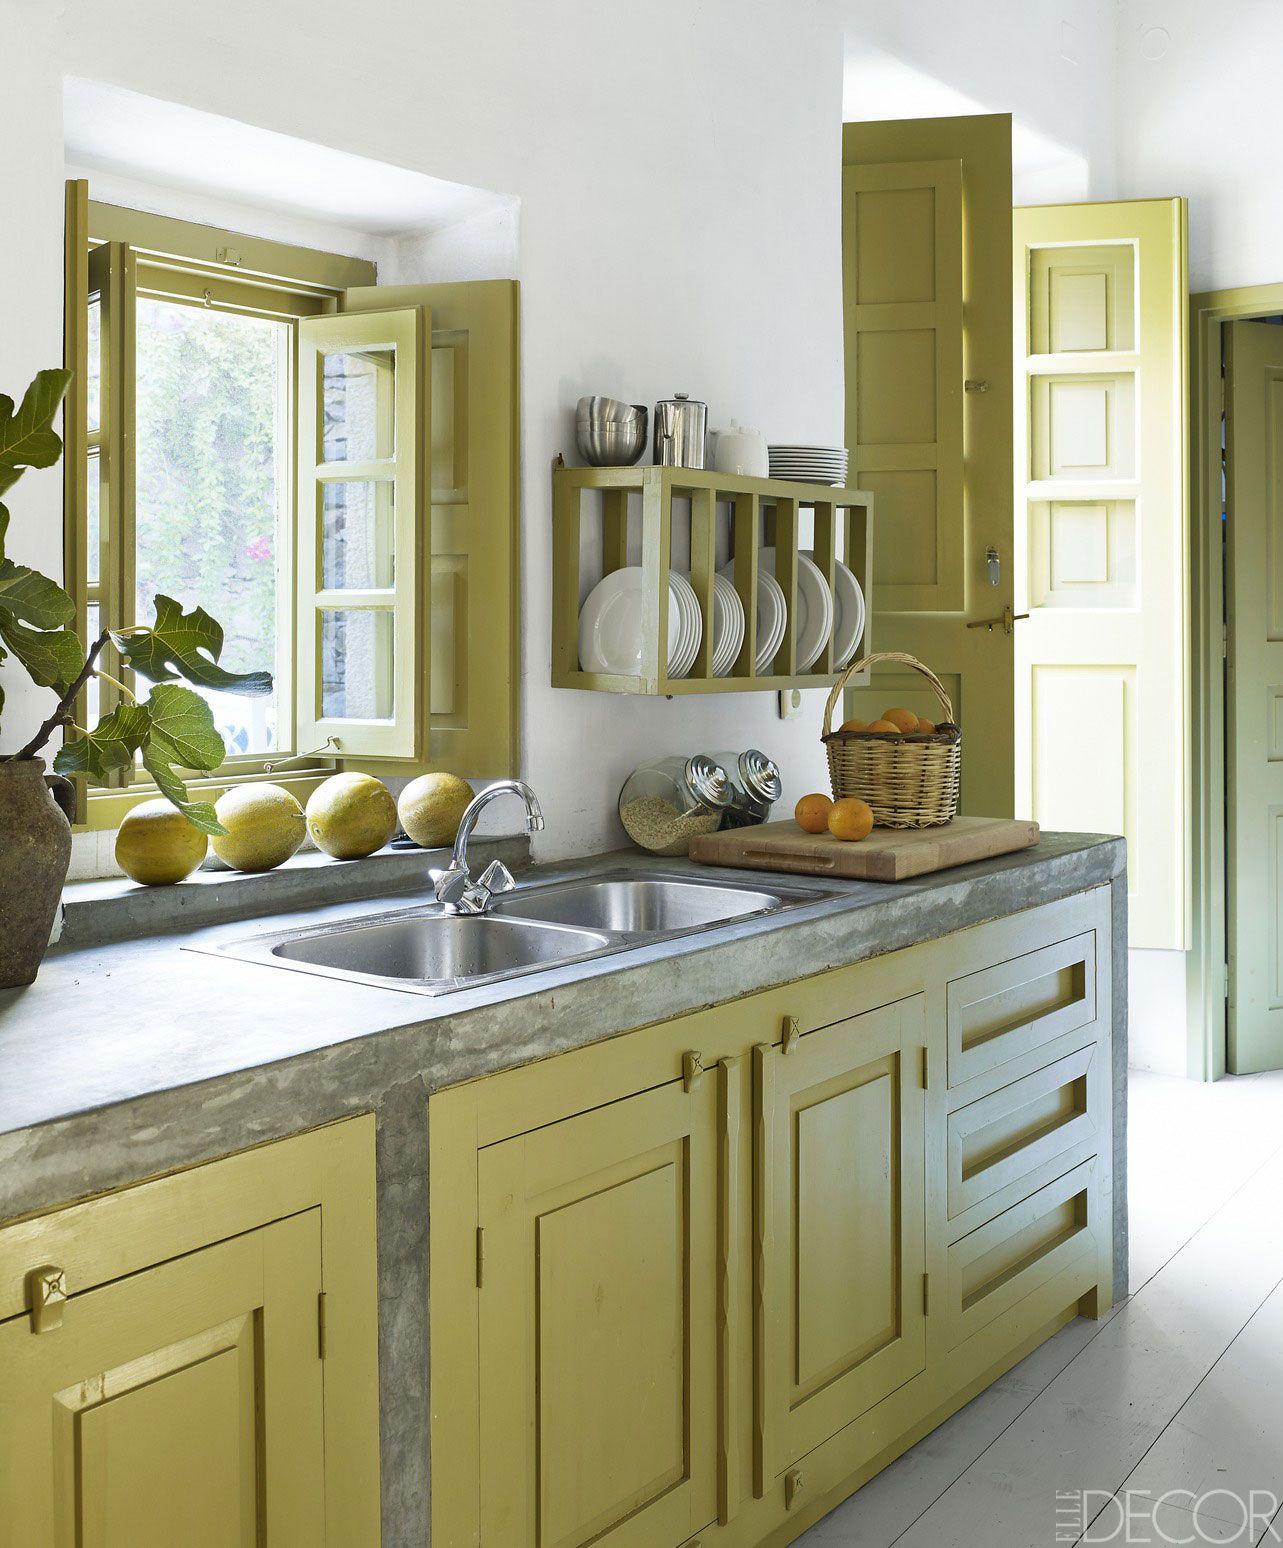 60 Brilliant Small Kitchen Ideas u2013 Gorgeous Small Kitchen Designs